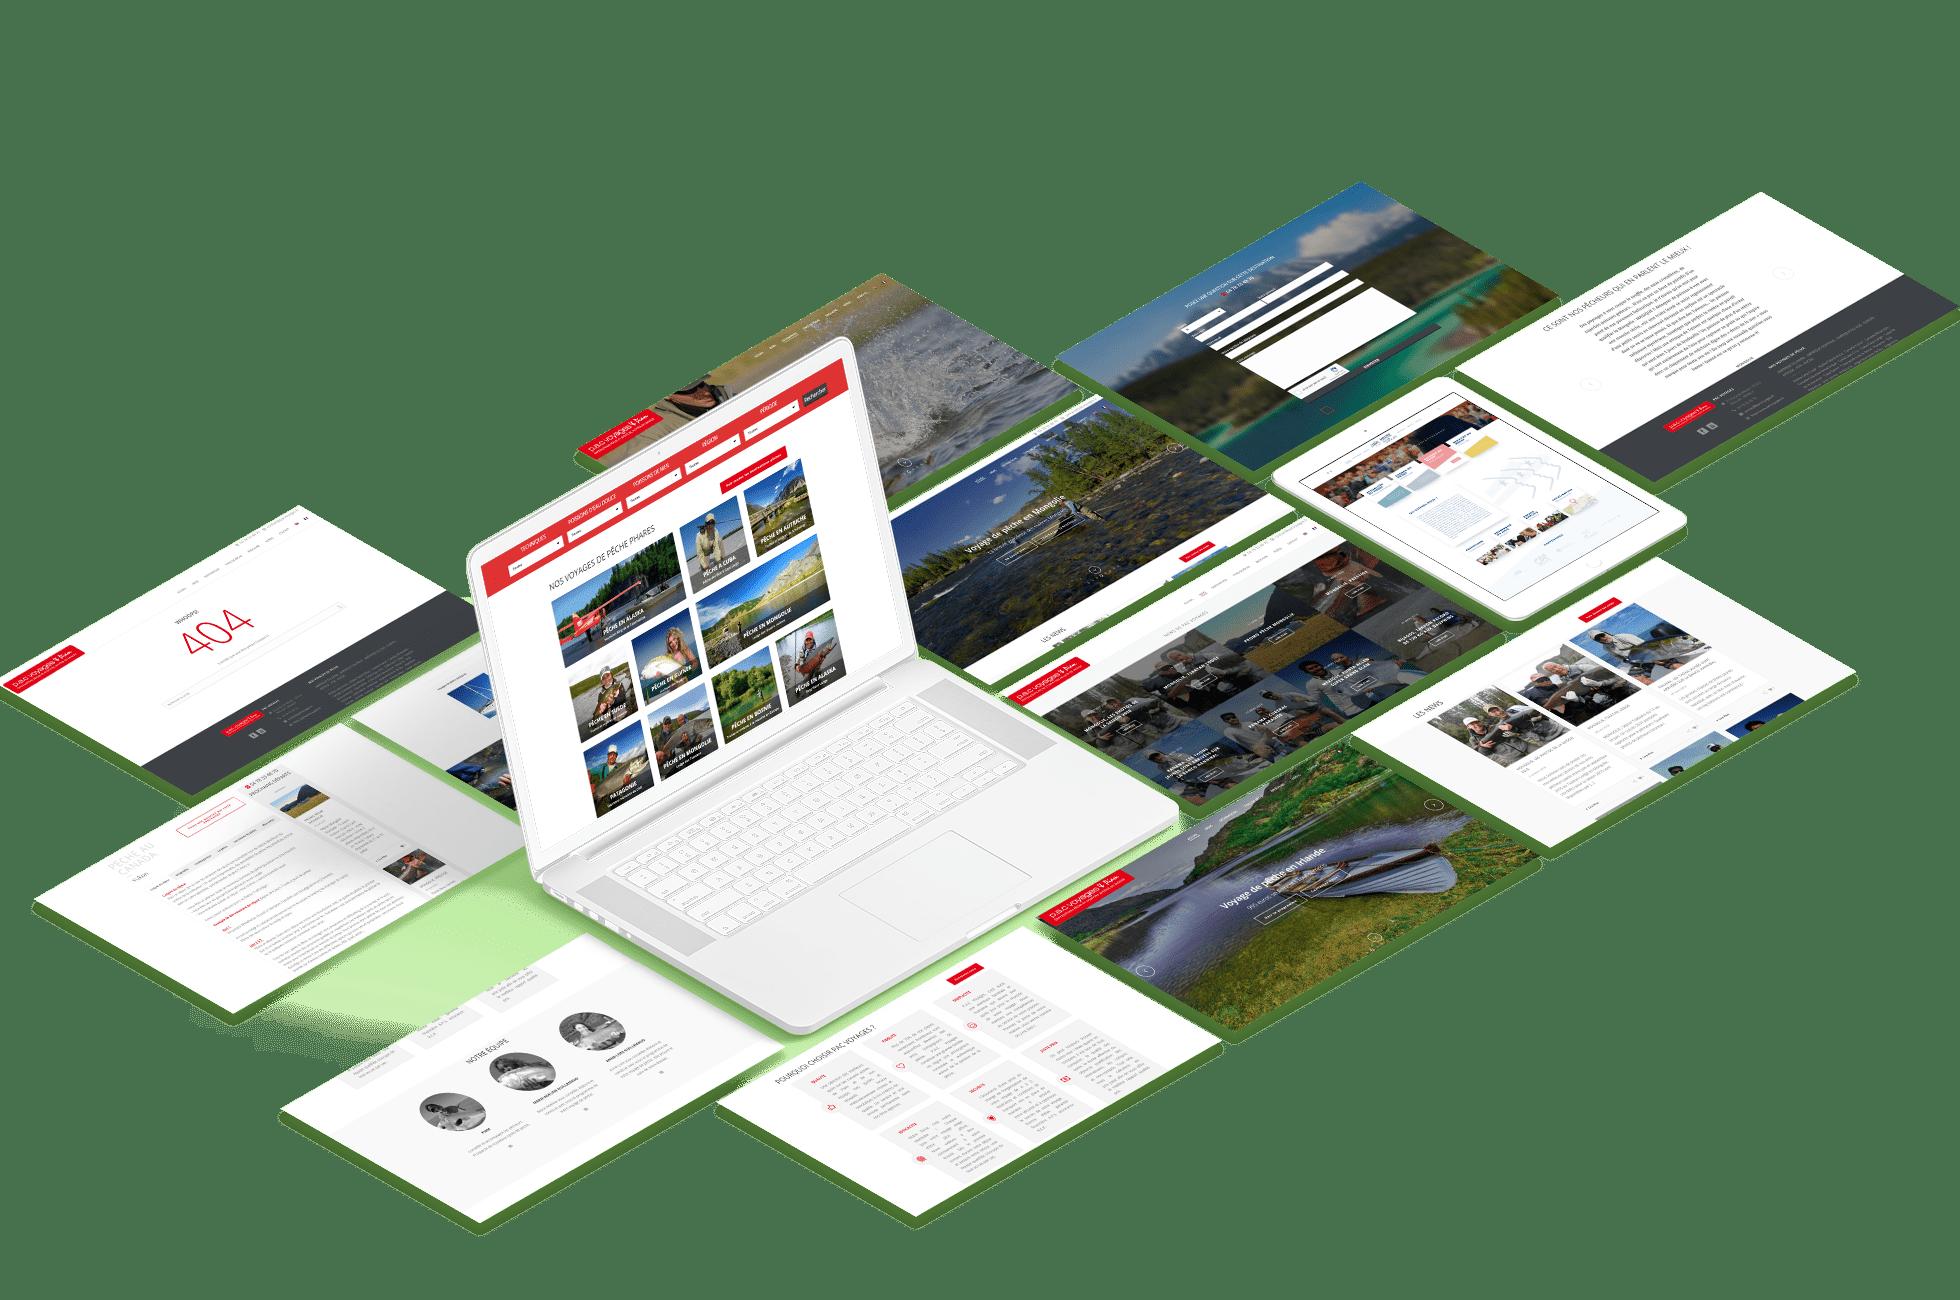 isometrics PAC agence web design site wordpress boutique commerce ecommerce graphisme logo icones